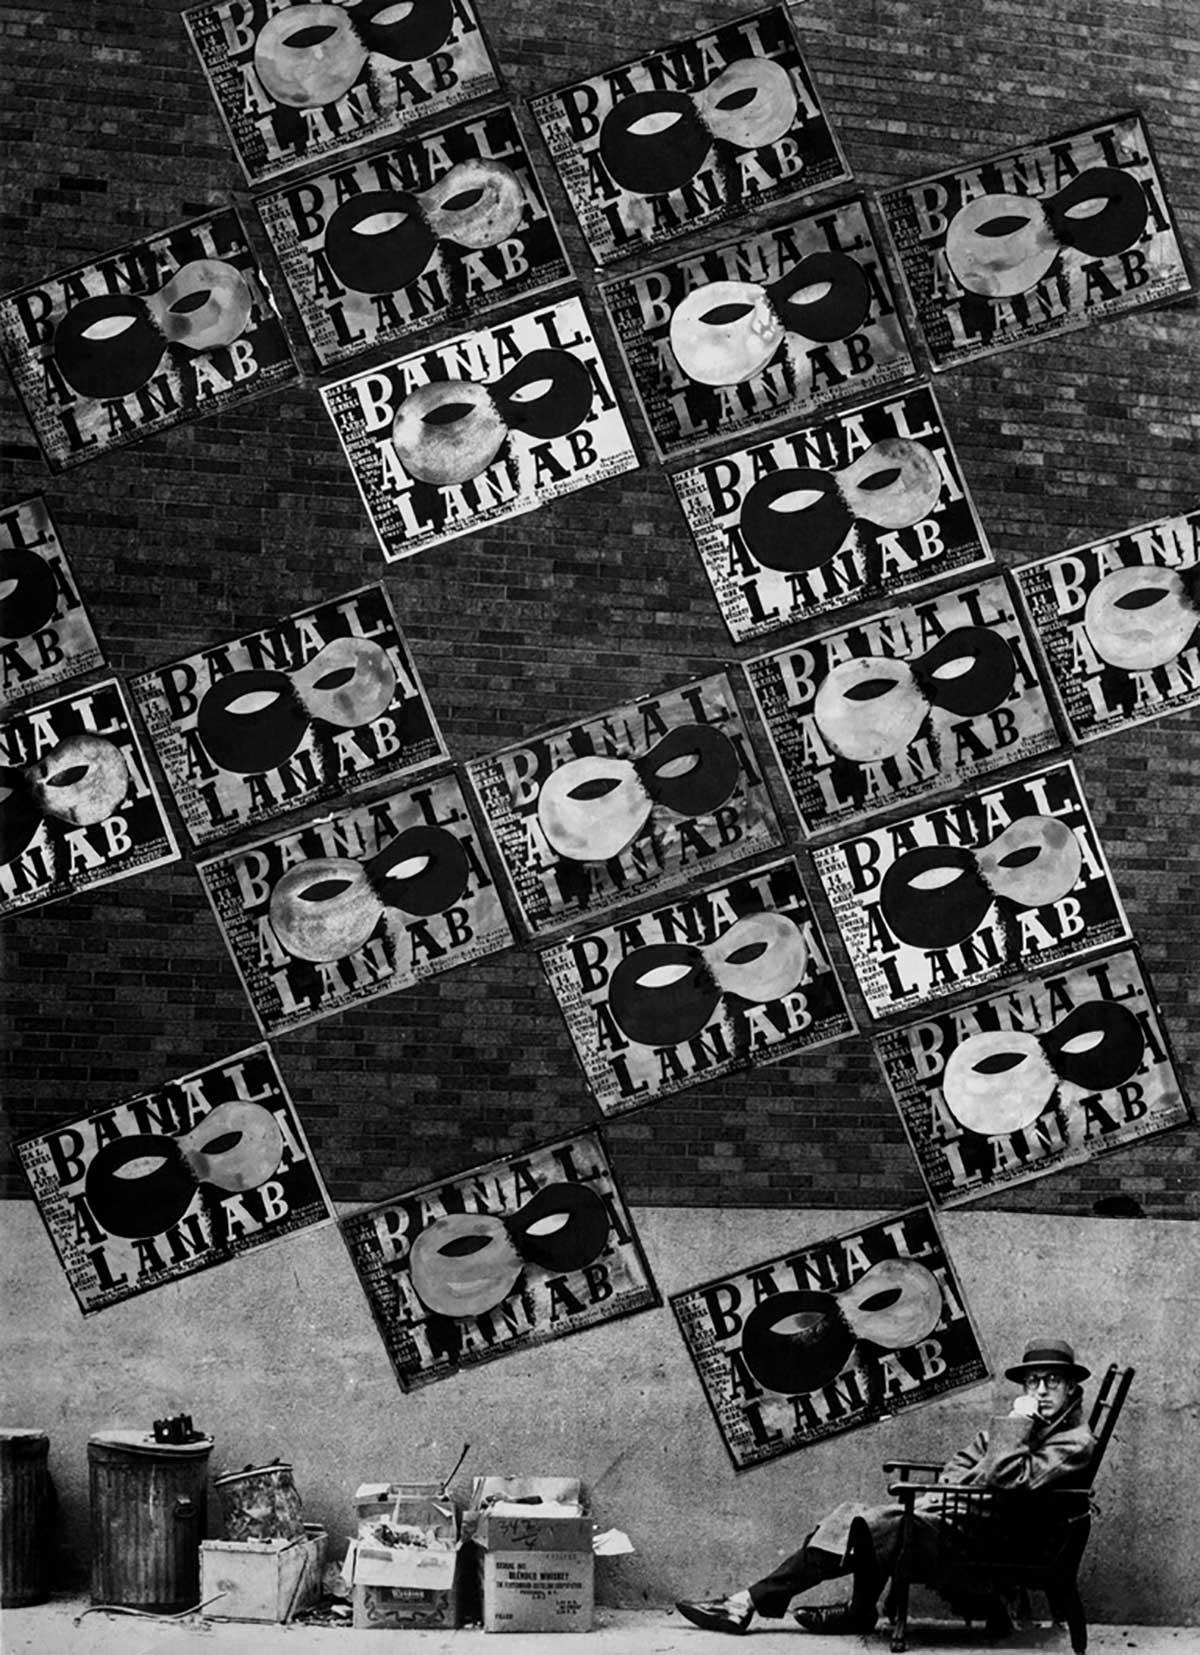 Alexey-Brodovitch-bal-banal-1924-mur